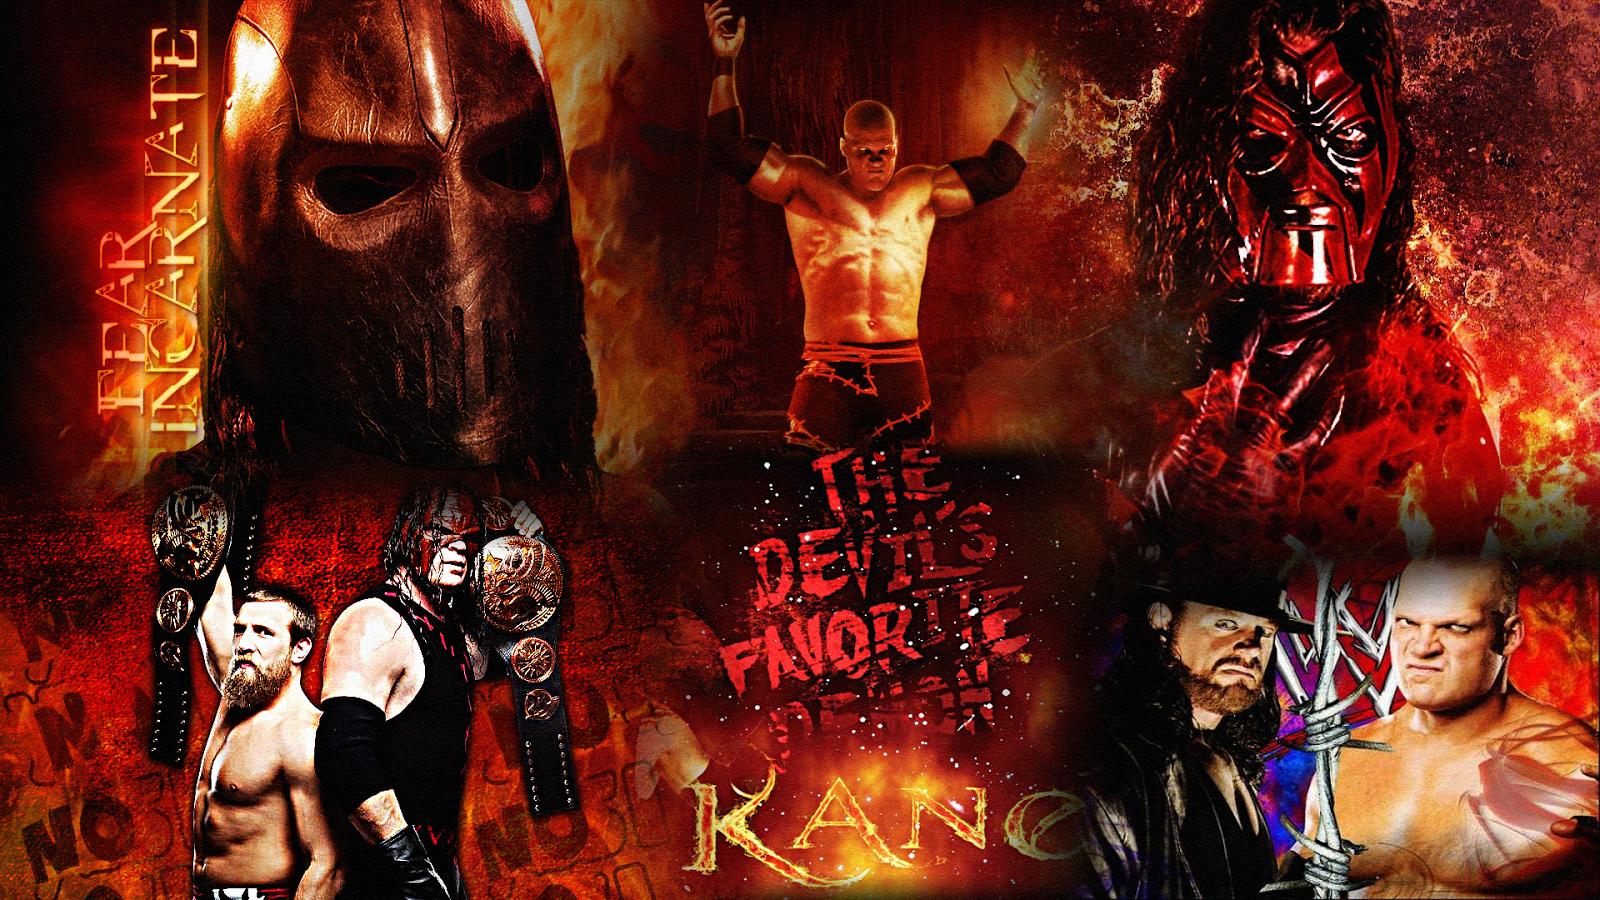 Kane 2014 Wallpapers - Wallpapers